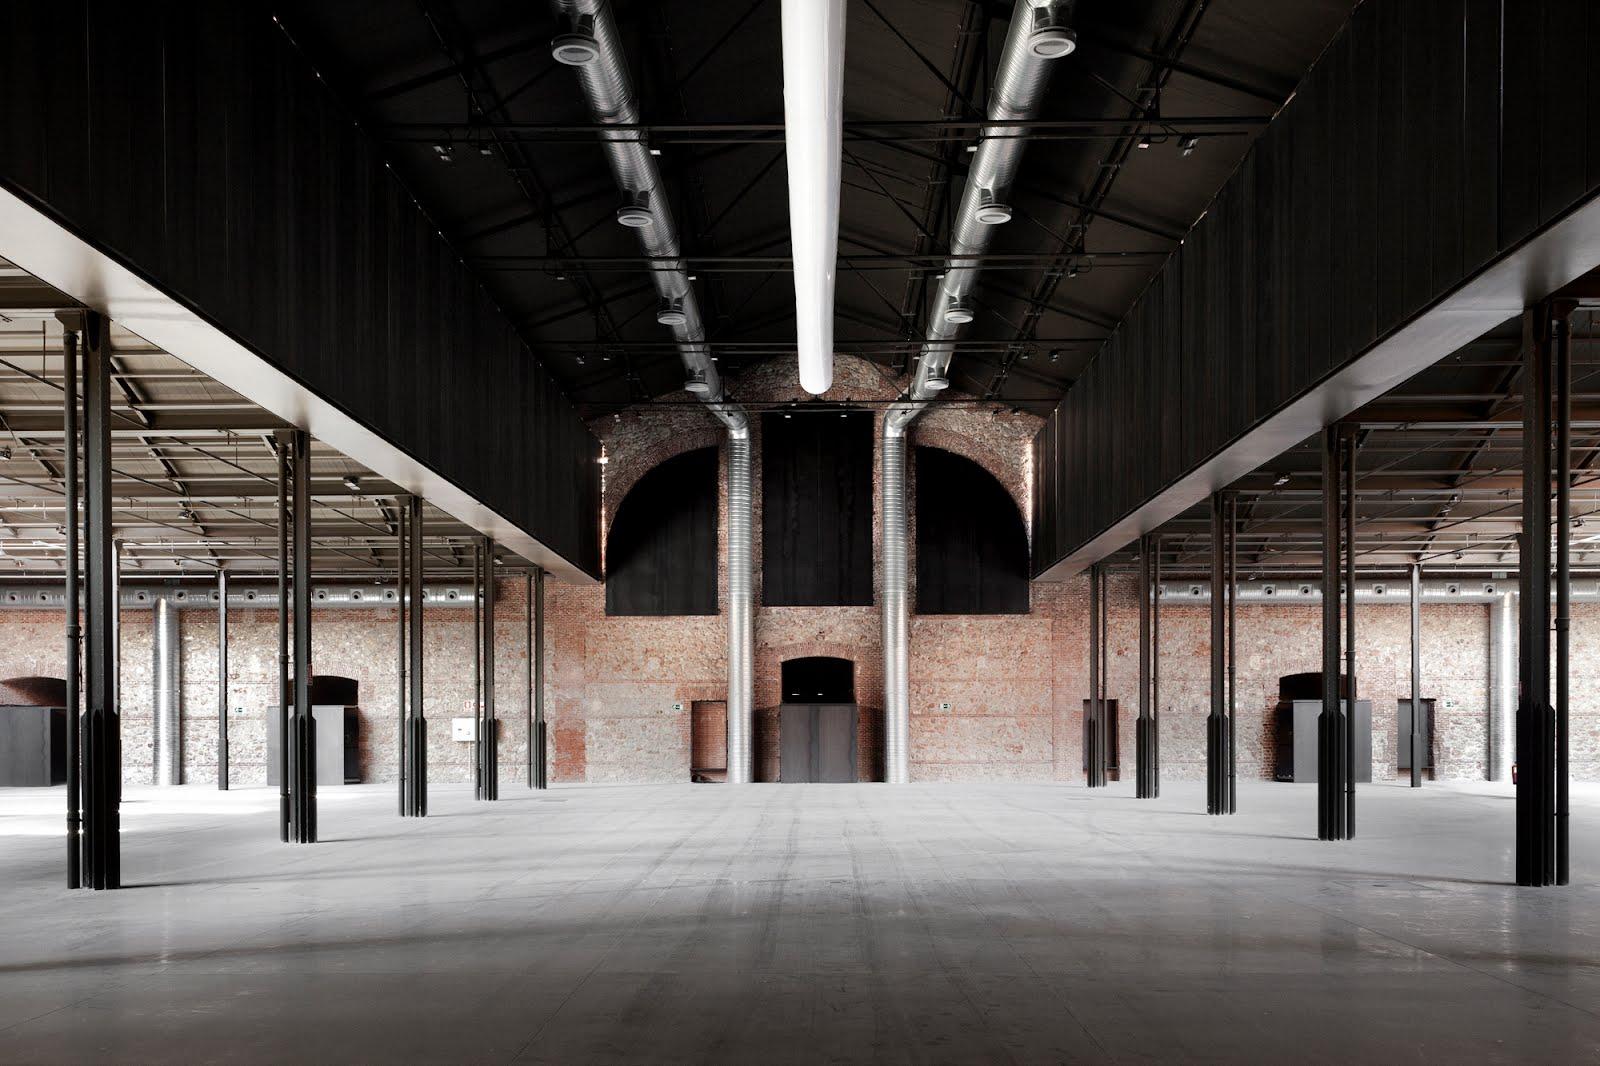 Bak nave 16 matadero madrid for Plataforma arquitectura